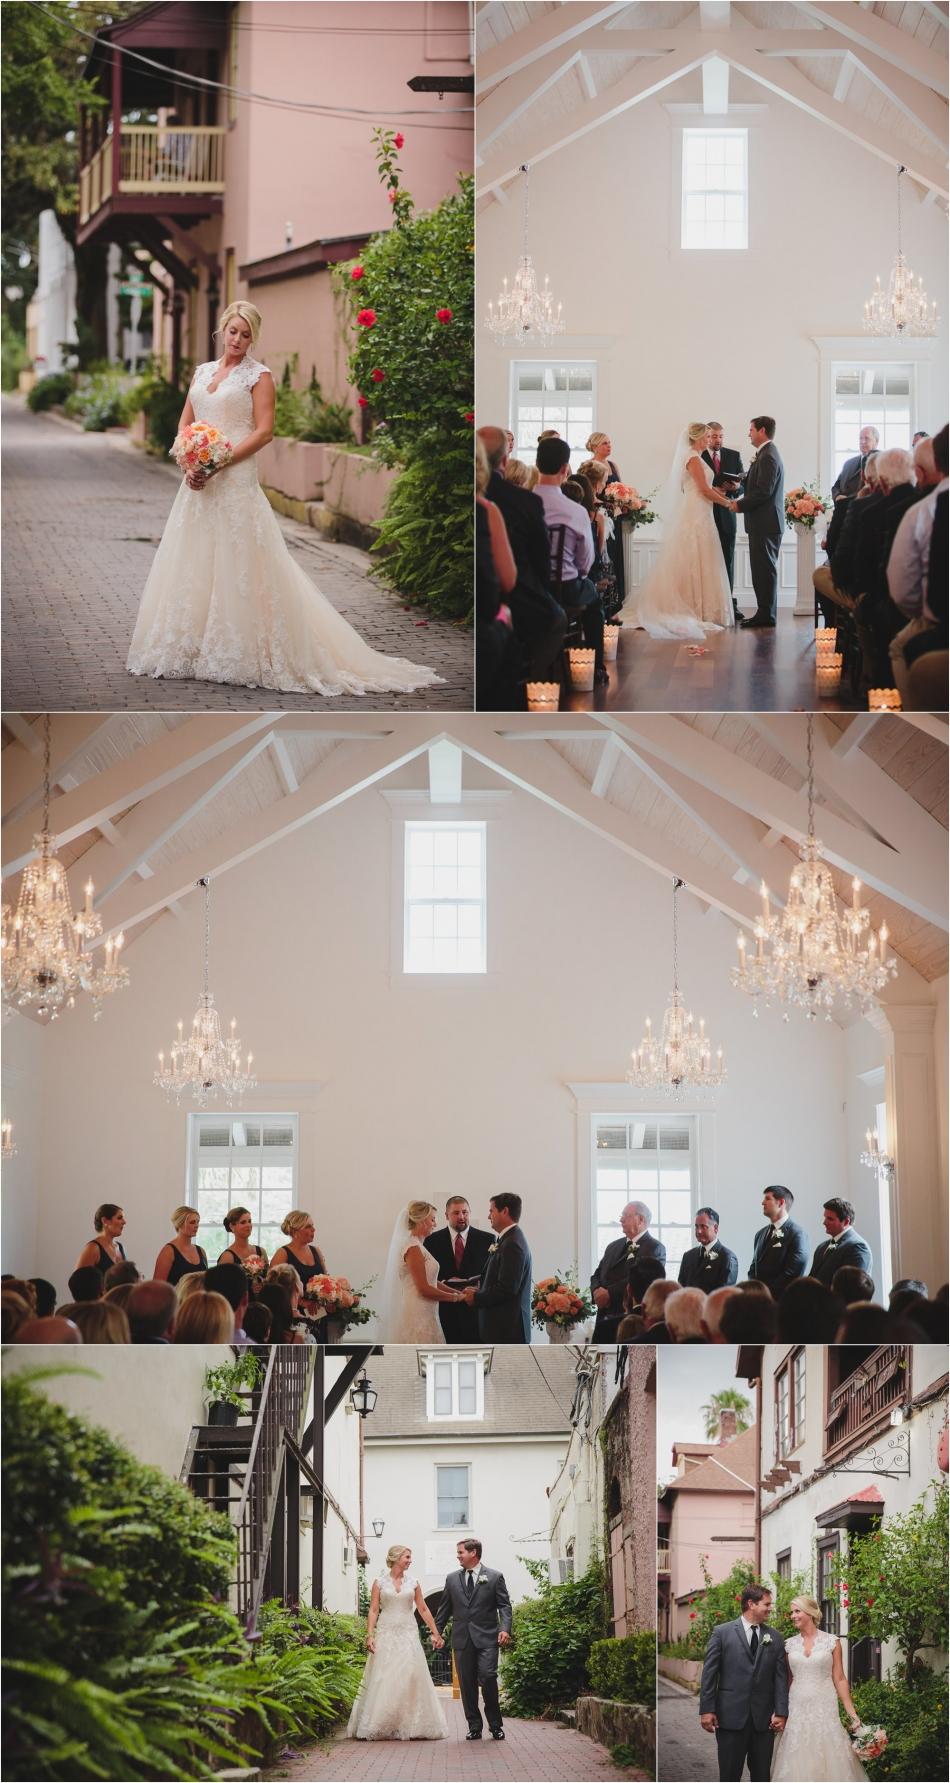 stephanie-w-photography-villa-blanca-wedding-0002.jpg